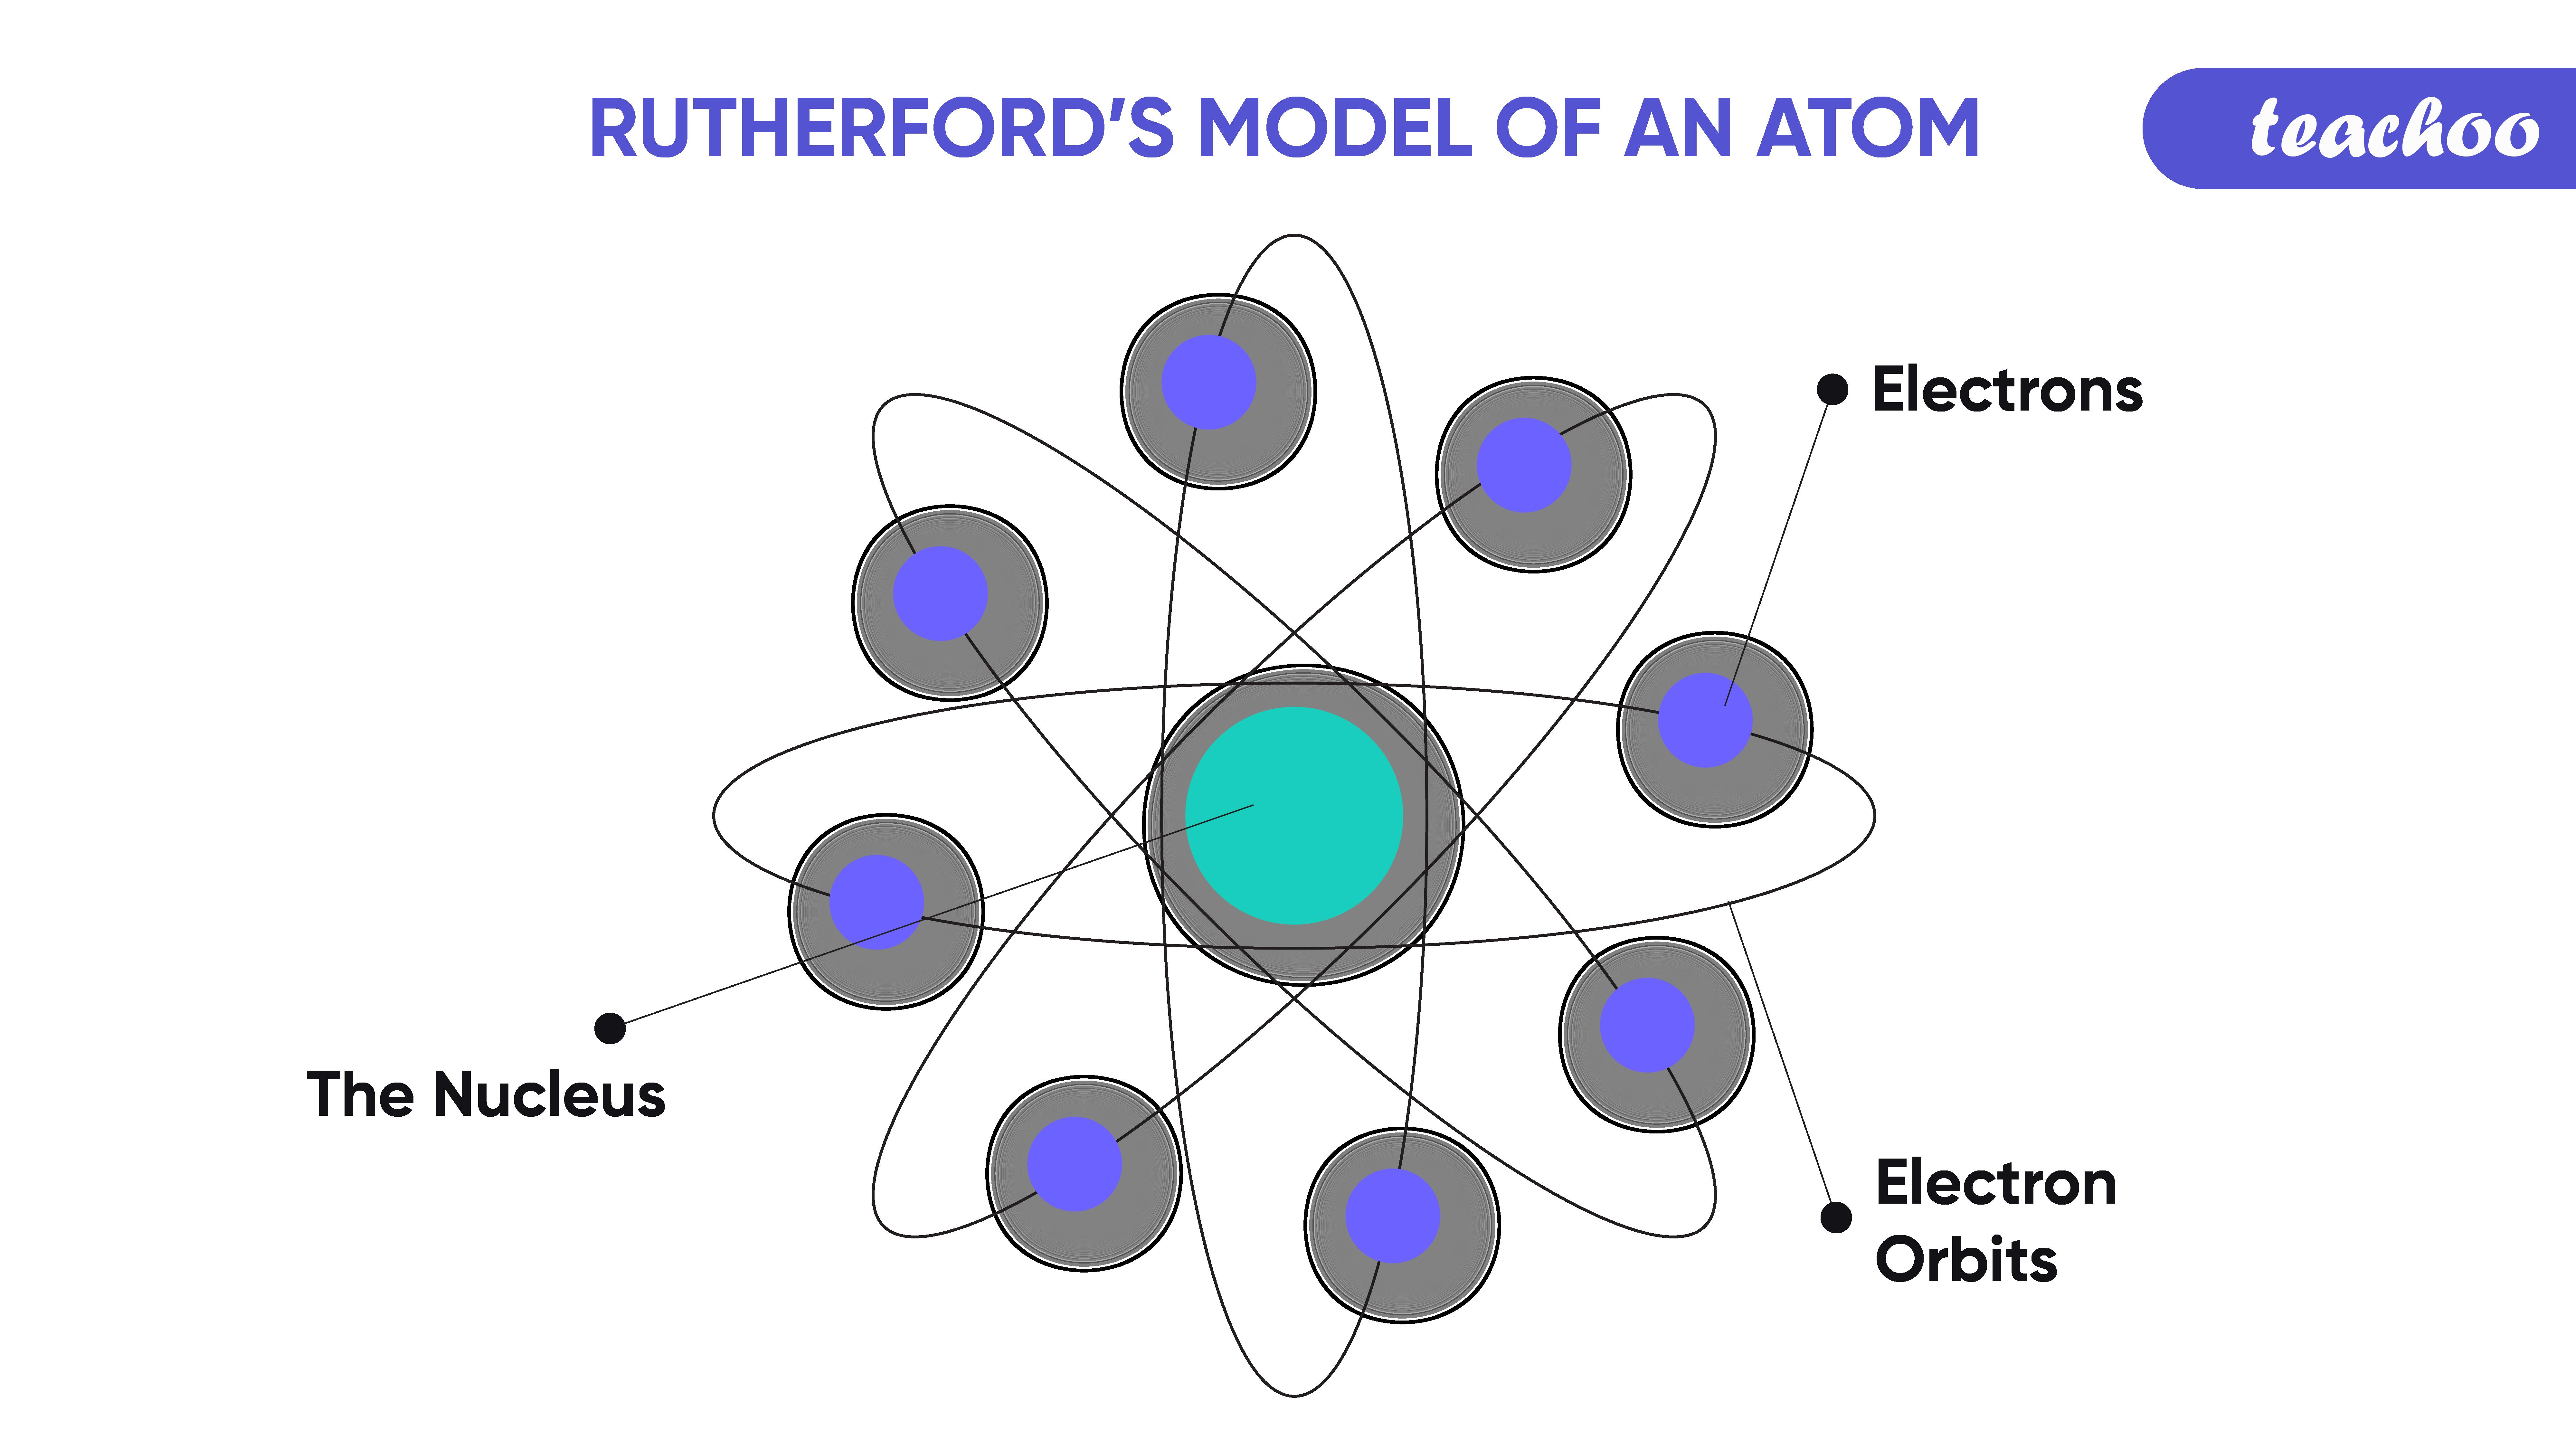 5.rutherfords model of an atom-Teachoo.png